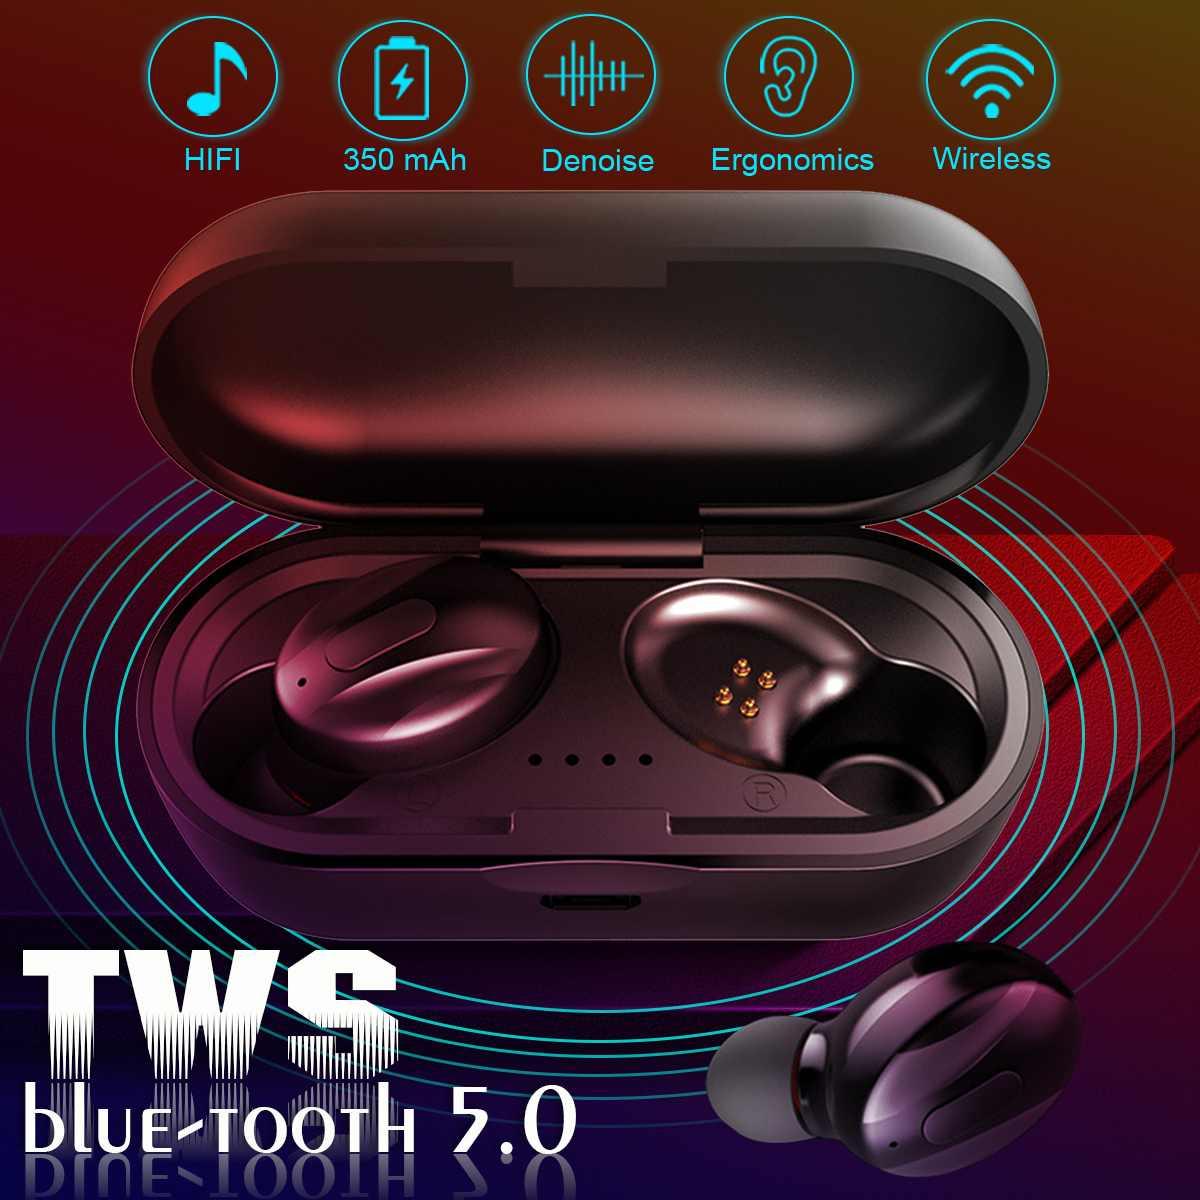 TWS bluetooth 5.0 Earphone Wireless Earbus Headset with Microphone Power Bank Waterproof Noise Cancelling Sport Earphones